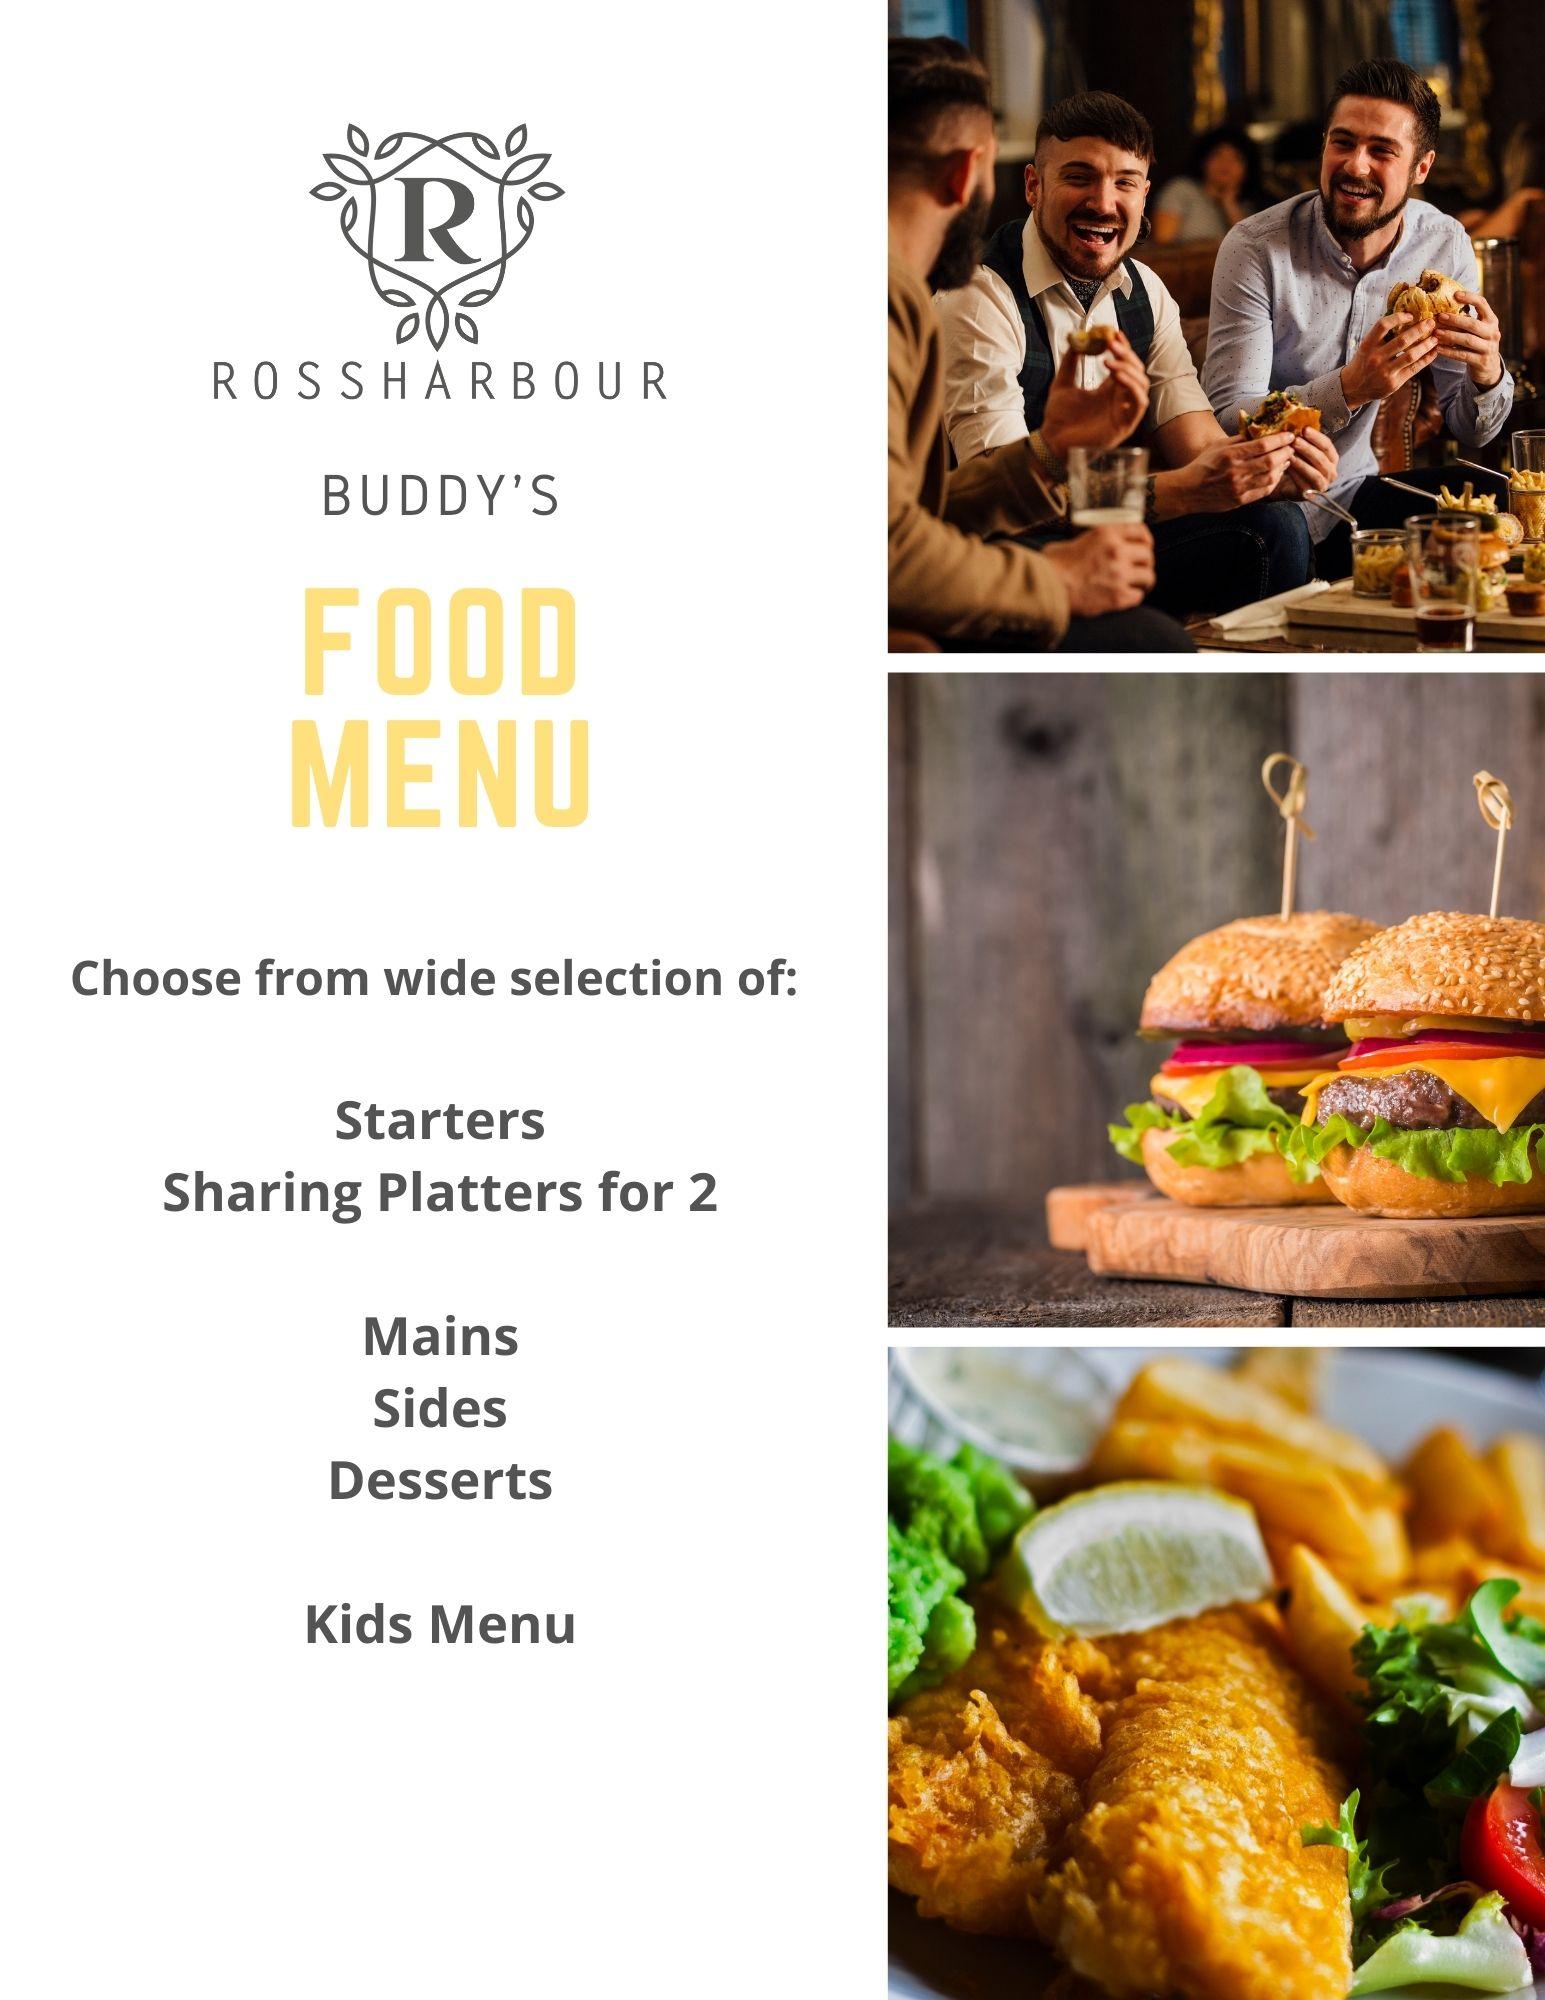 buddys-food-menu-29.04.21